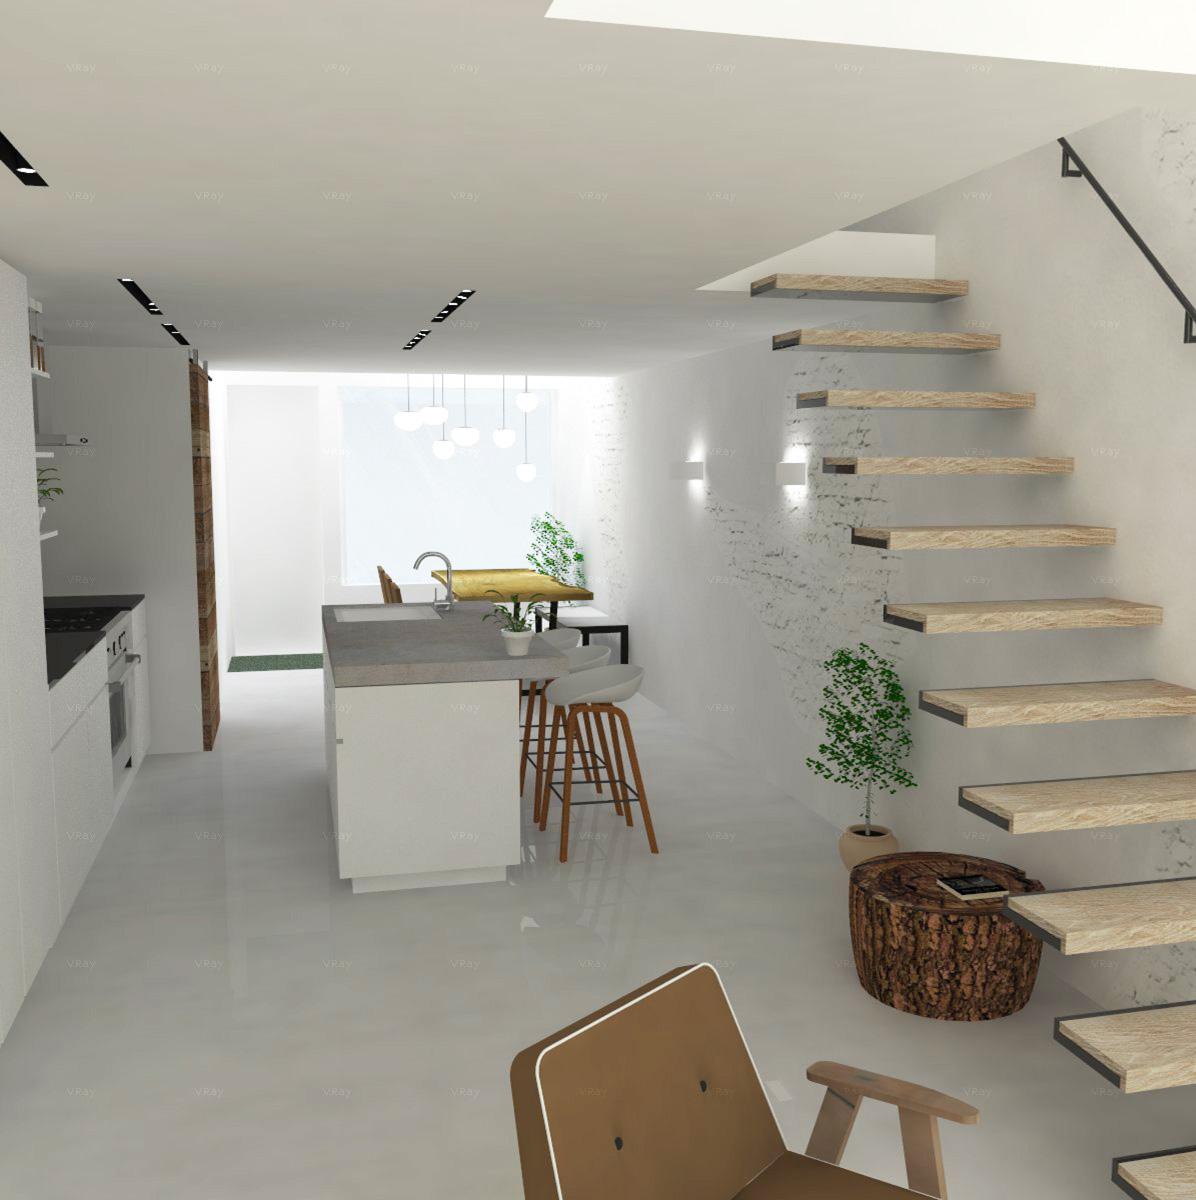 Huis Swinden, Amsterdam | micromacrodesign